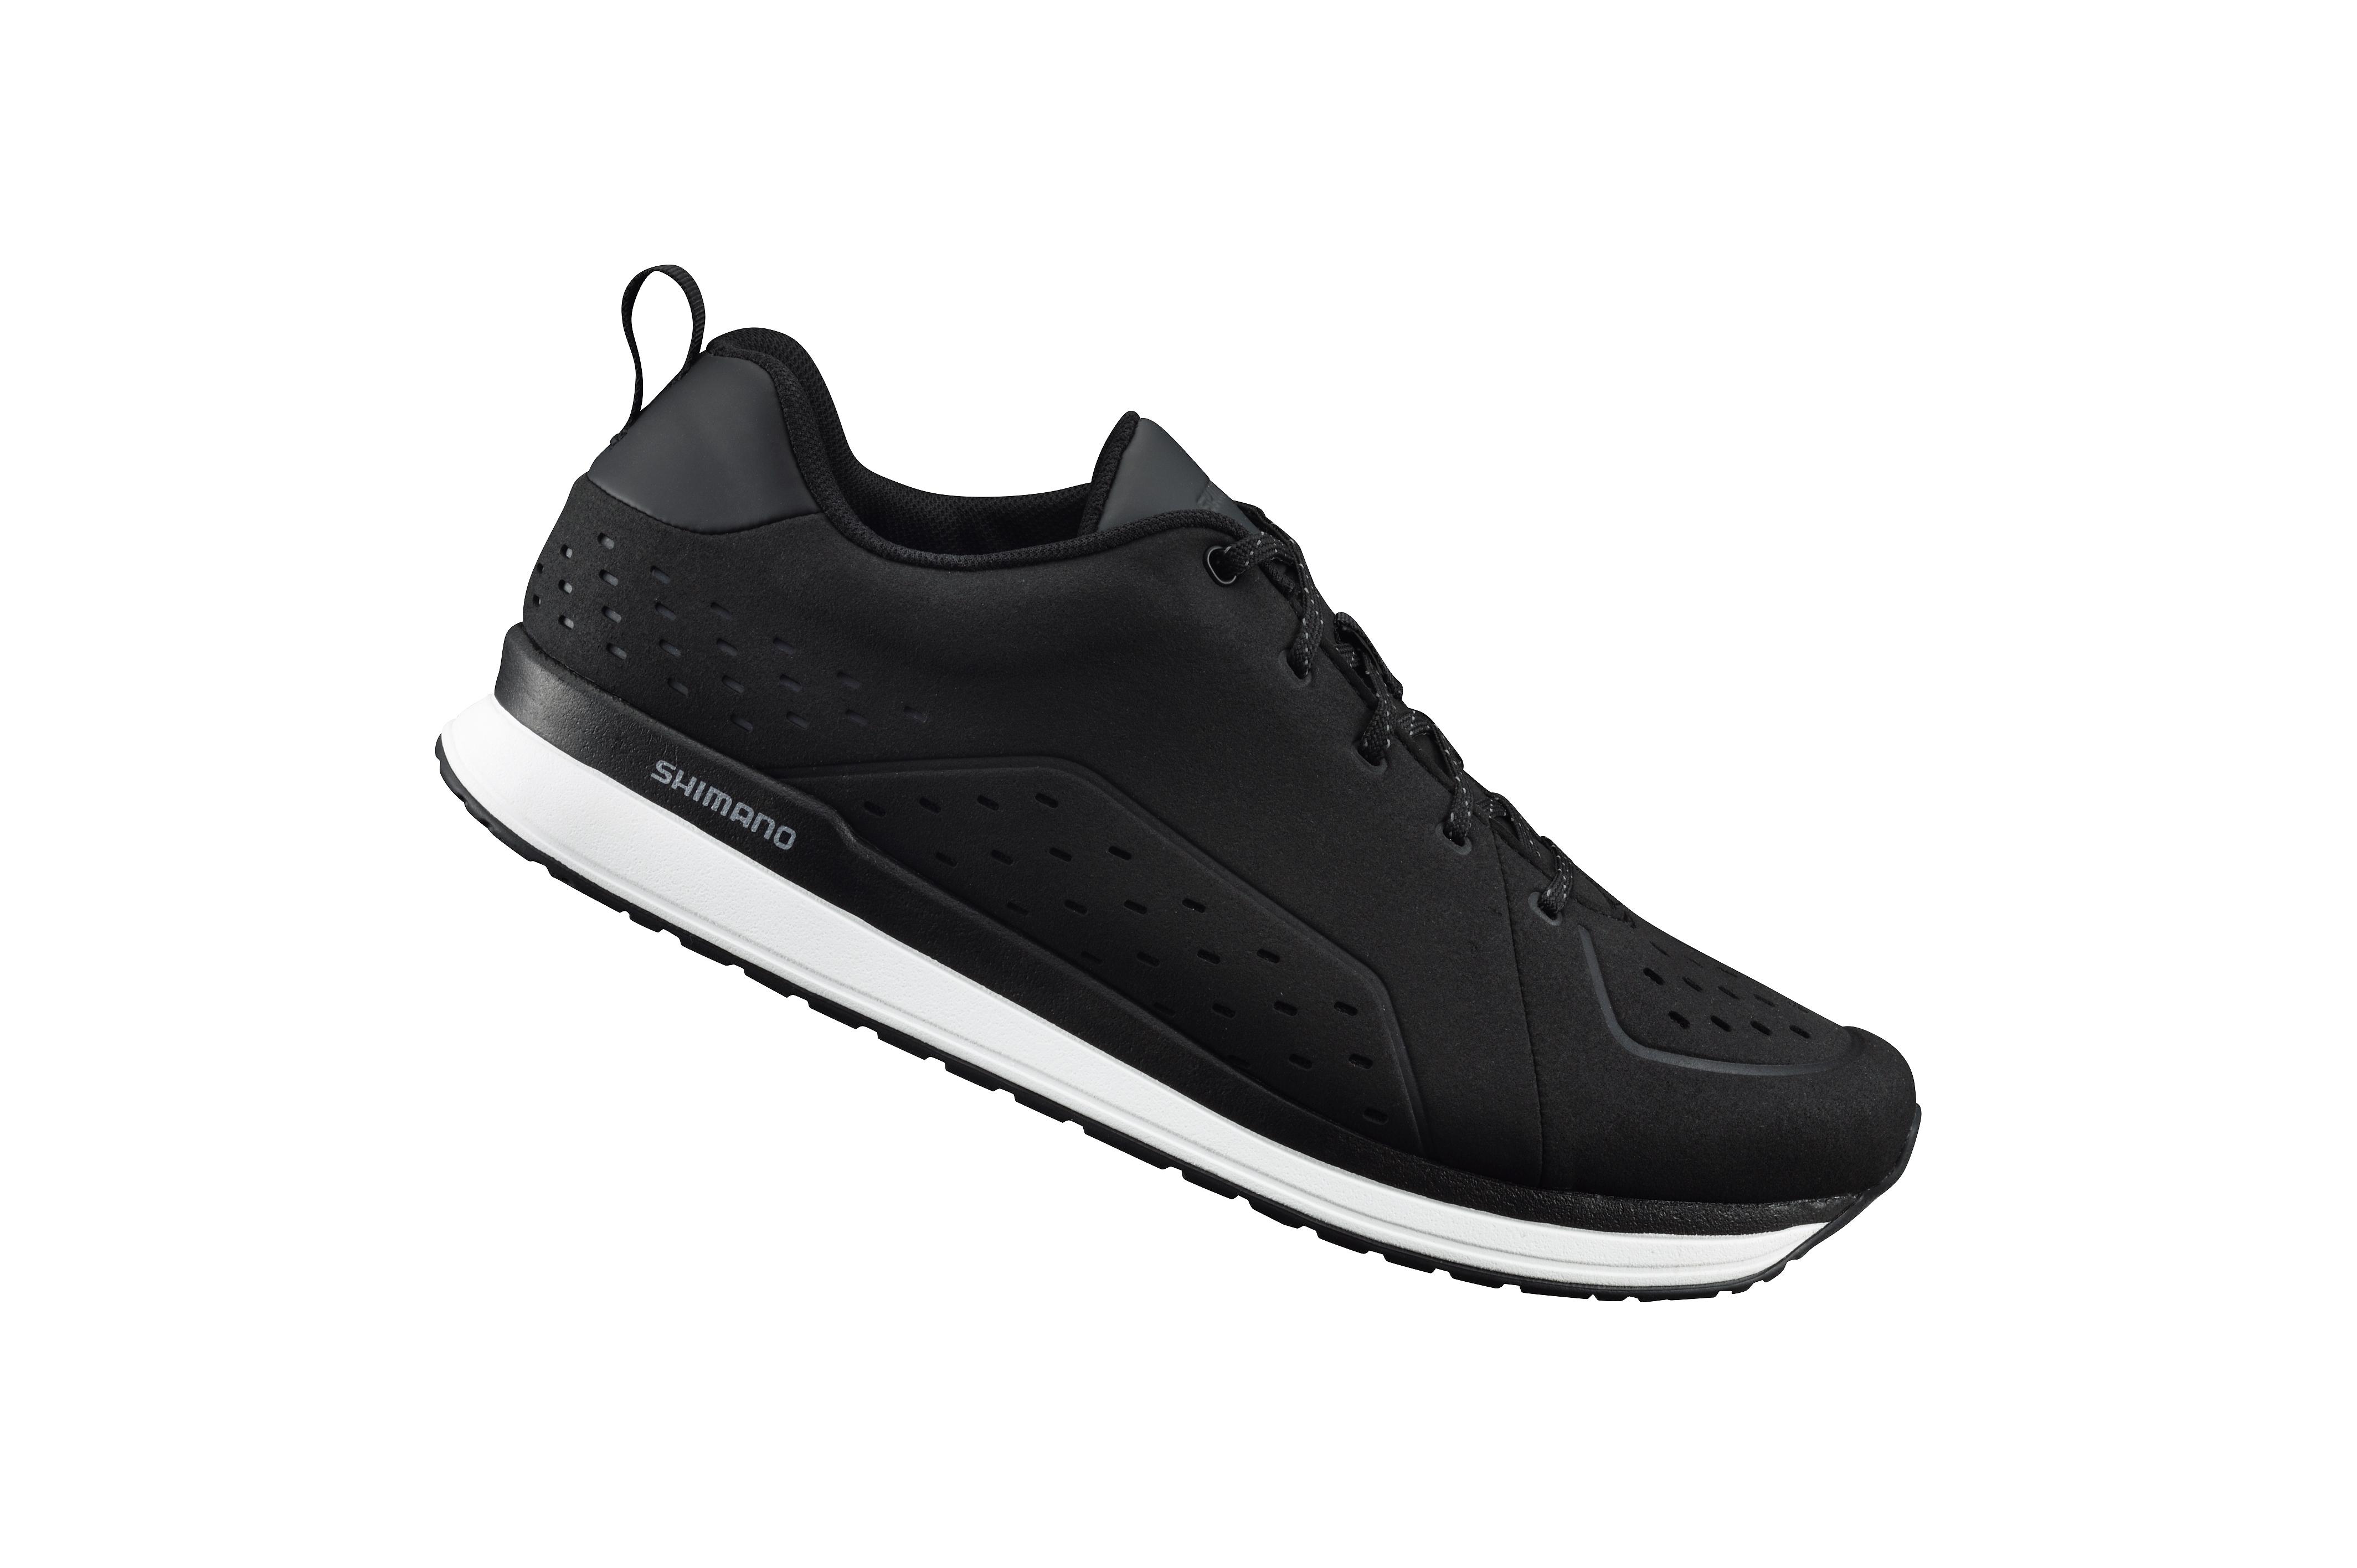 Shimano turistická obuv SH-CT500ML, černá, 41